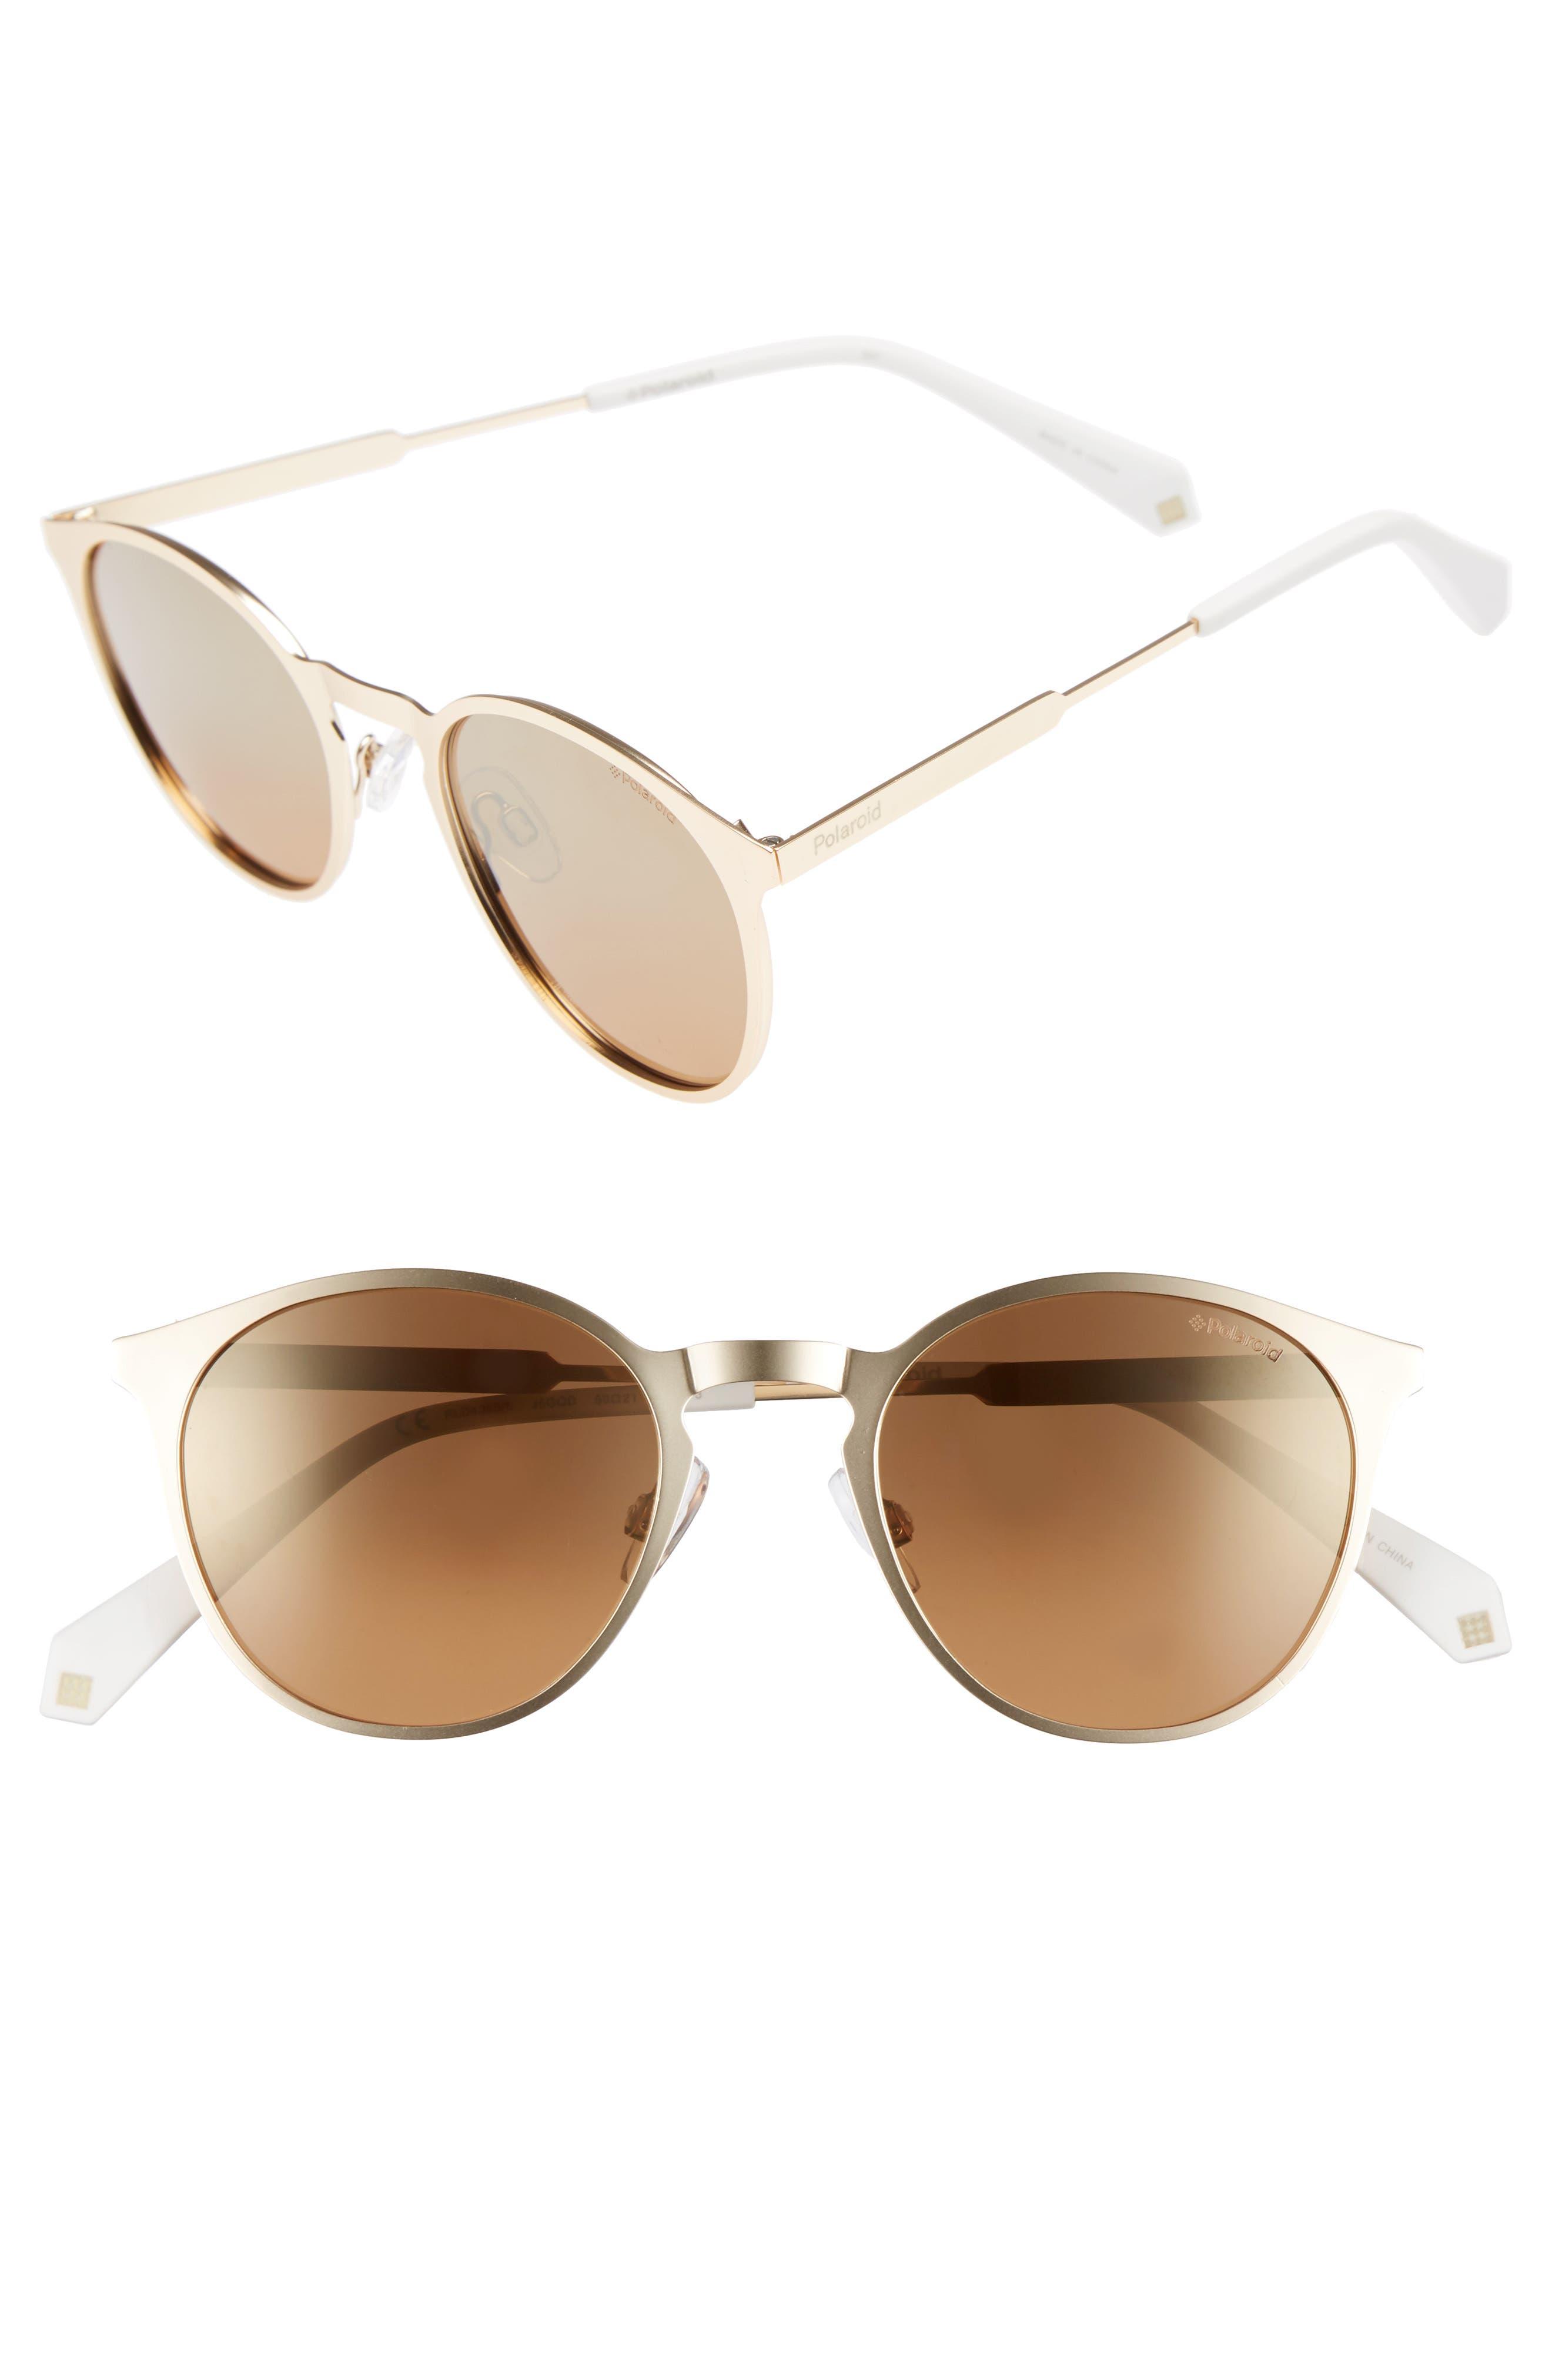 Polaroid 50Mm Round Polarized Sunglasses - Gold